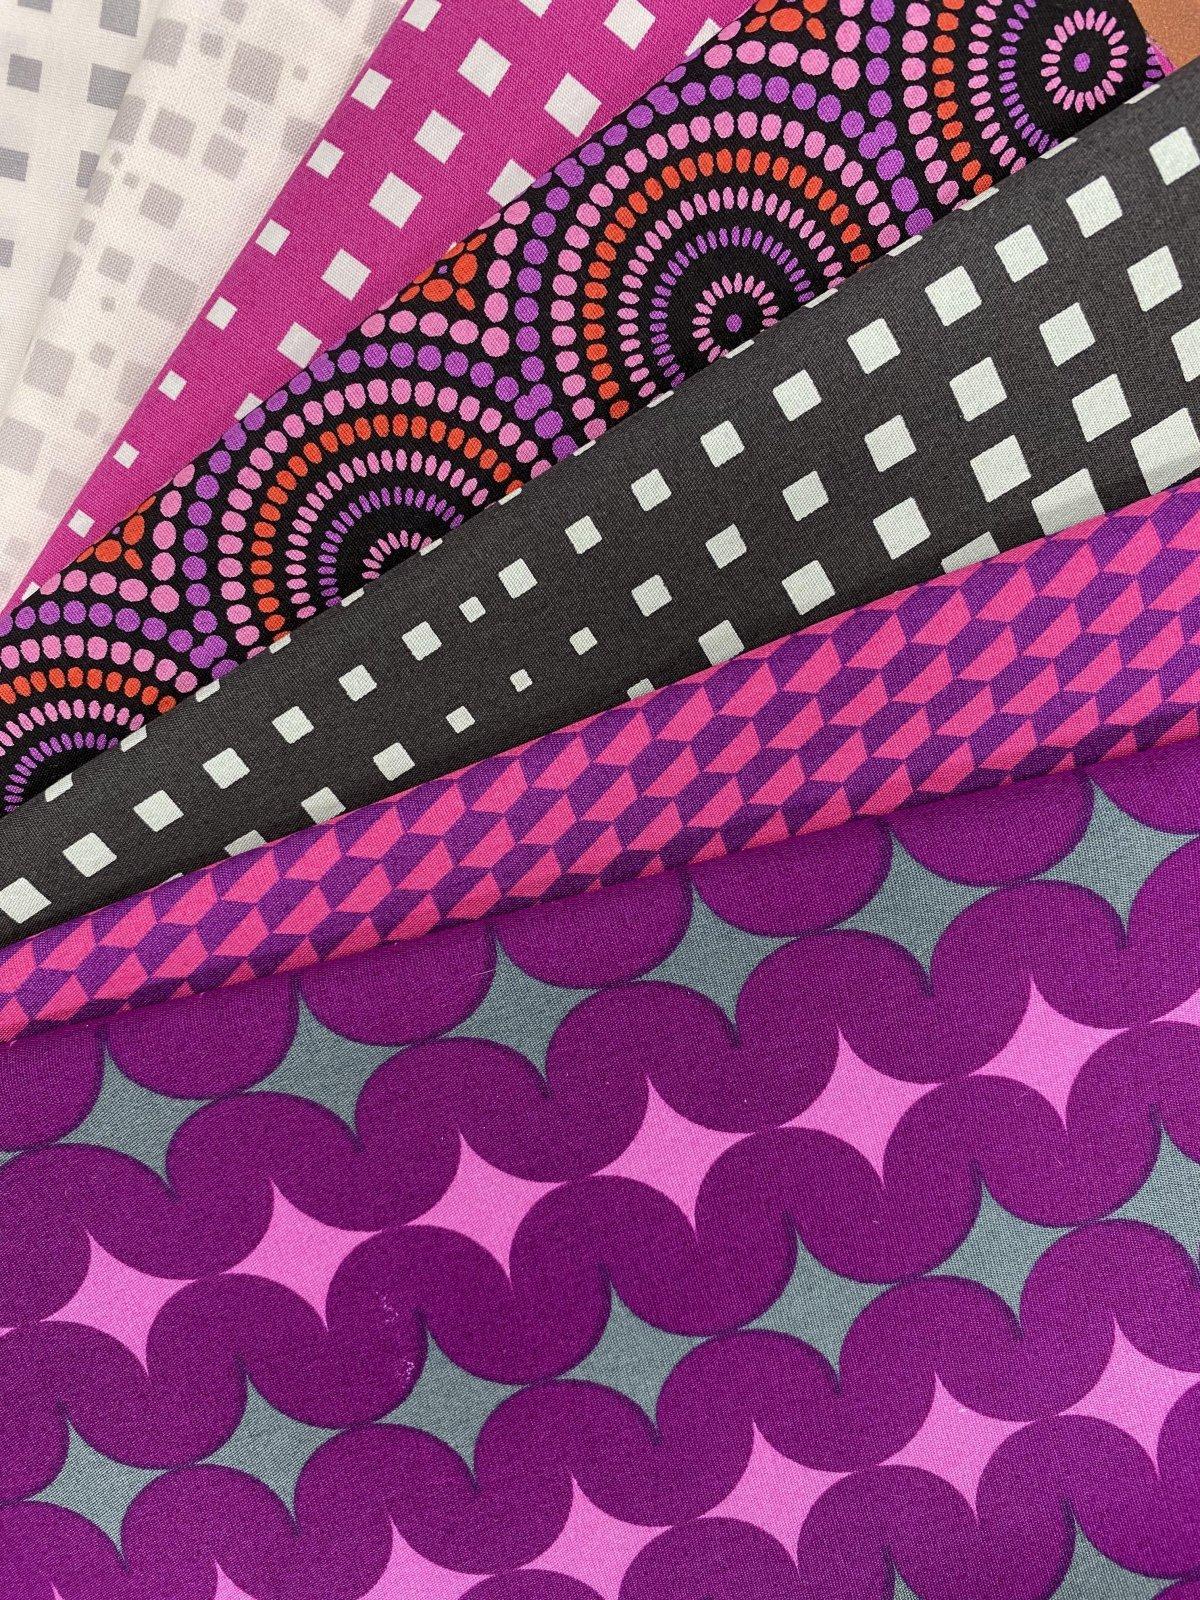 Fabric Kit - QAYG Zippered Cosmetic Bag Kit - Magenta - geo pop